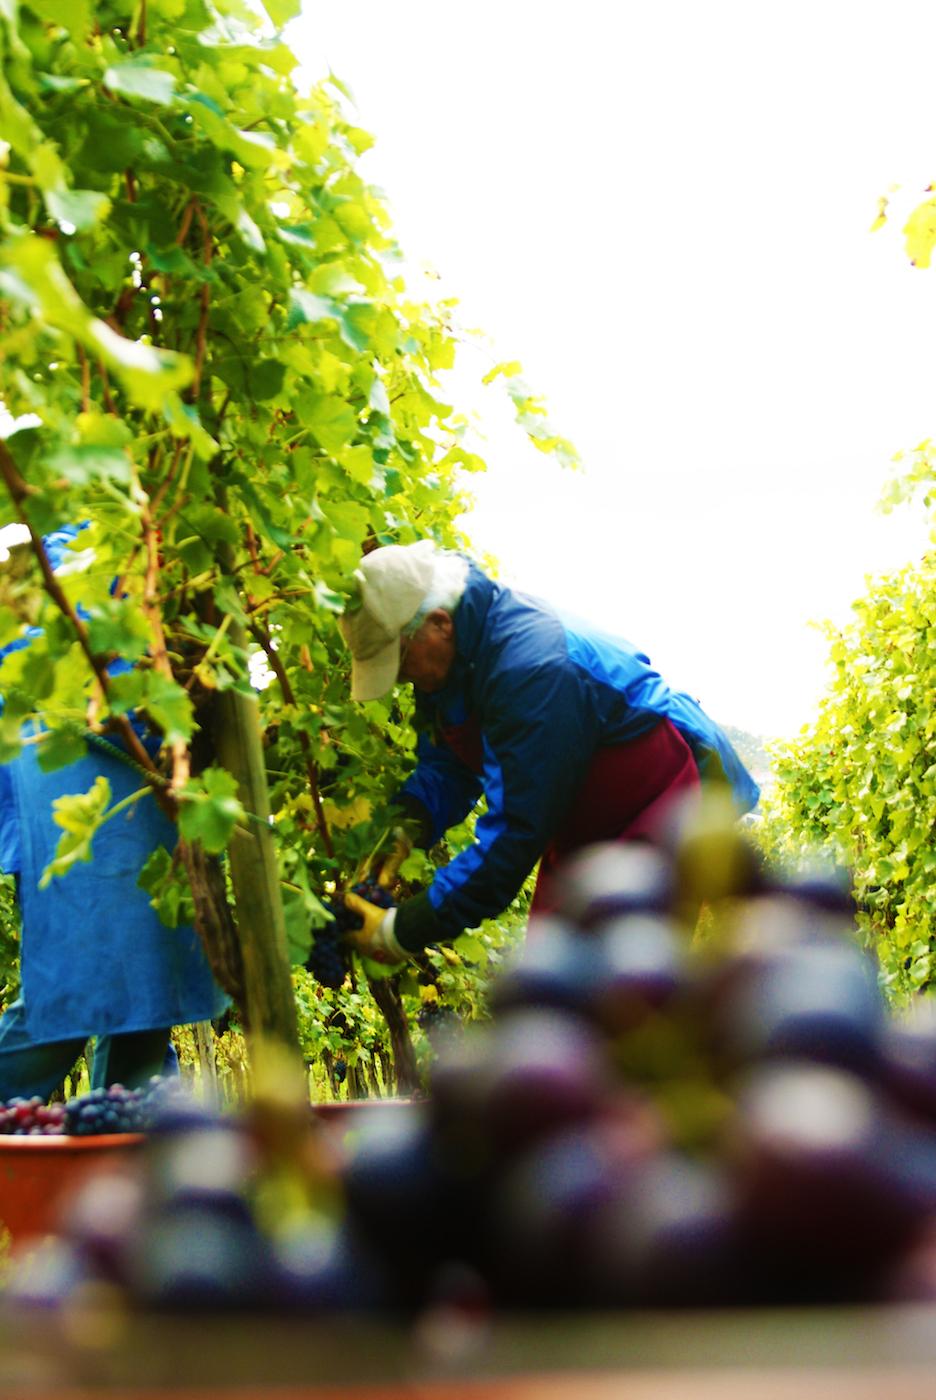 Vineyards are positioned on hillsides to allow an even distribution of rain. Image courtesy of Weinmanufaktur Untertürkheim.